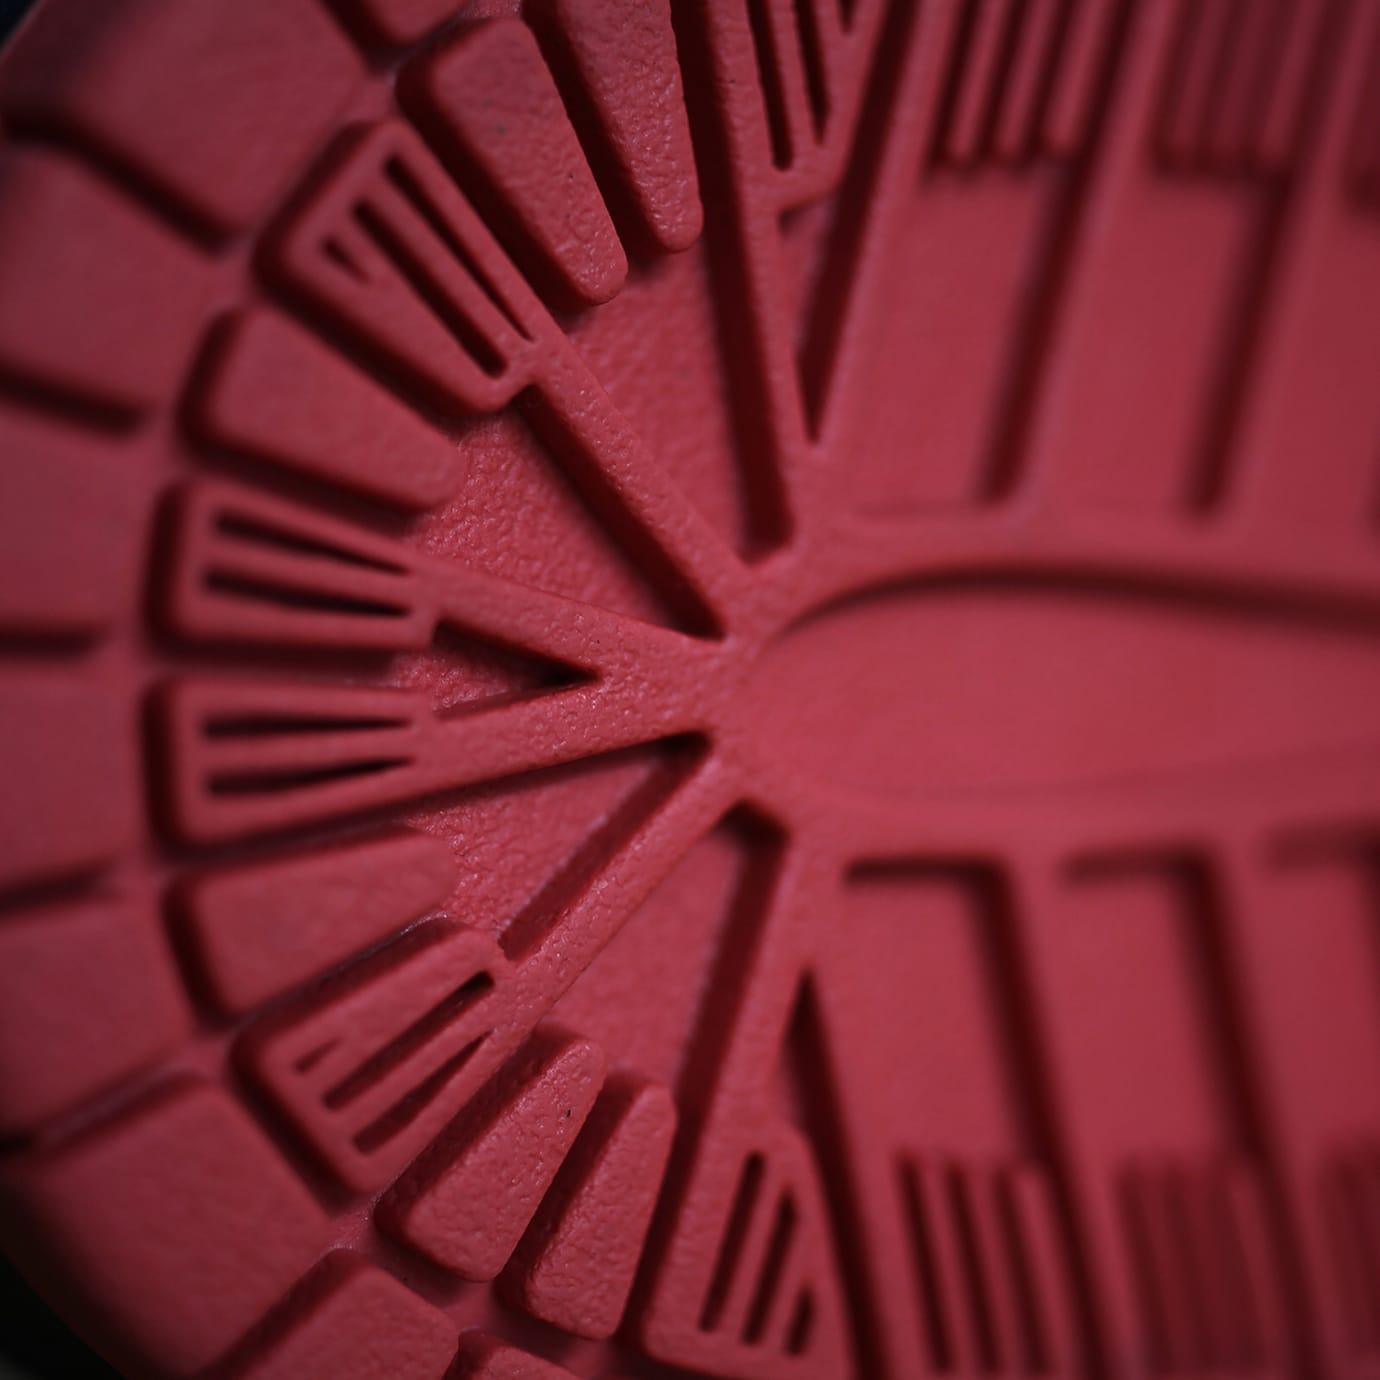 Nike SB Dunk Low Black Pigeon Release Date 88323-008 (17)